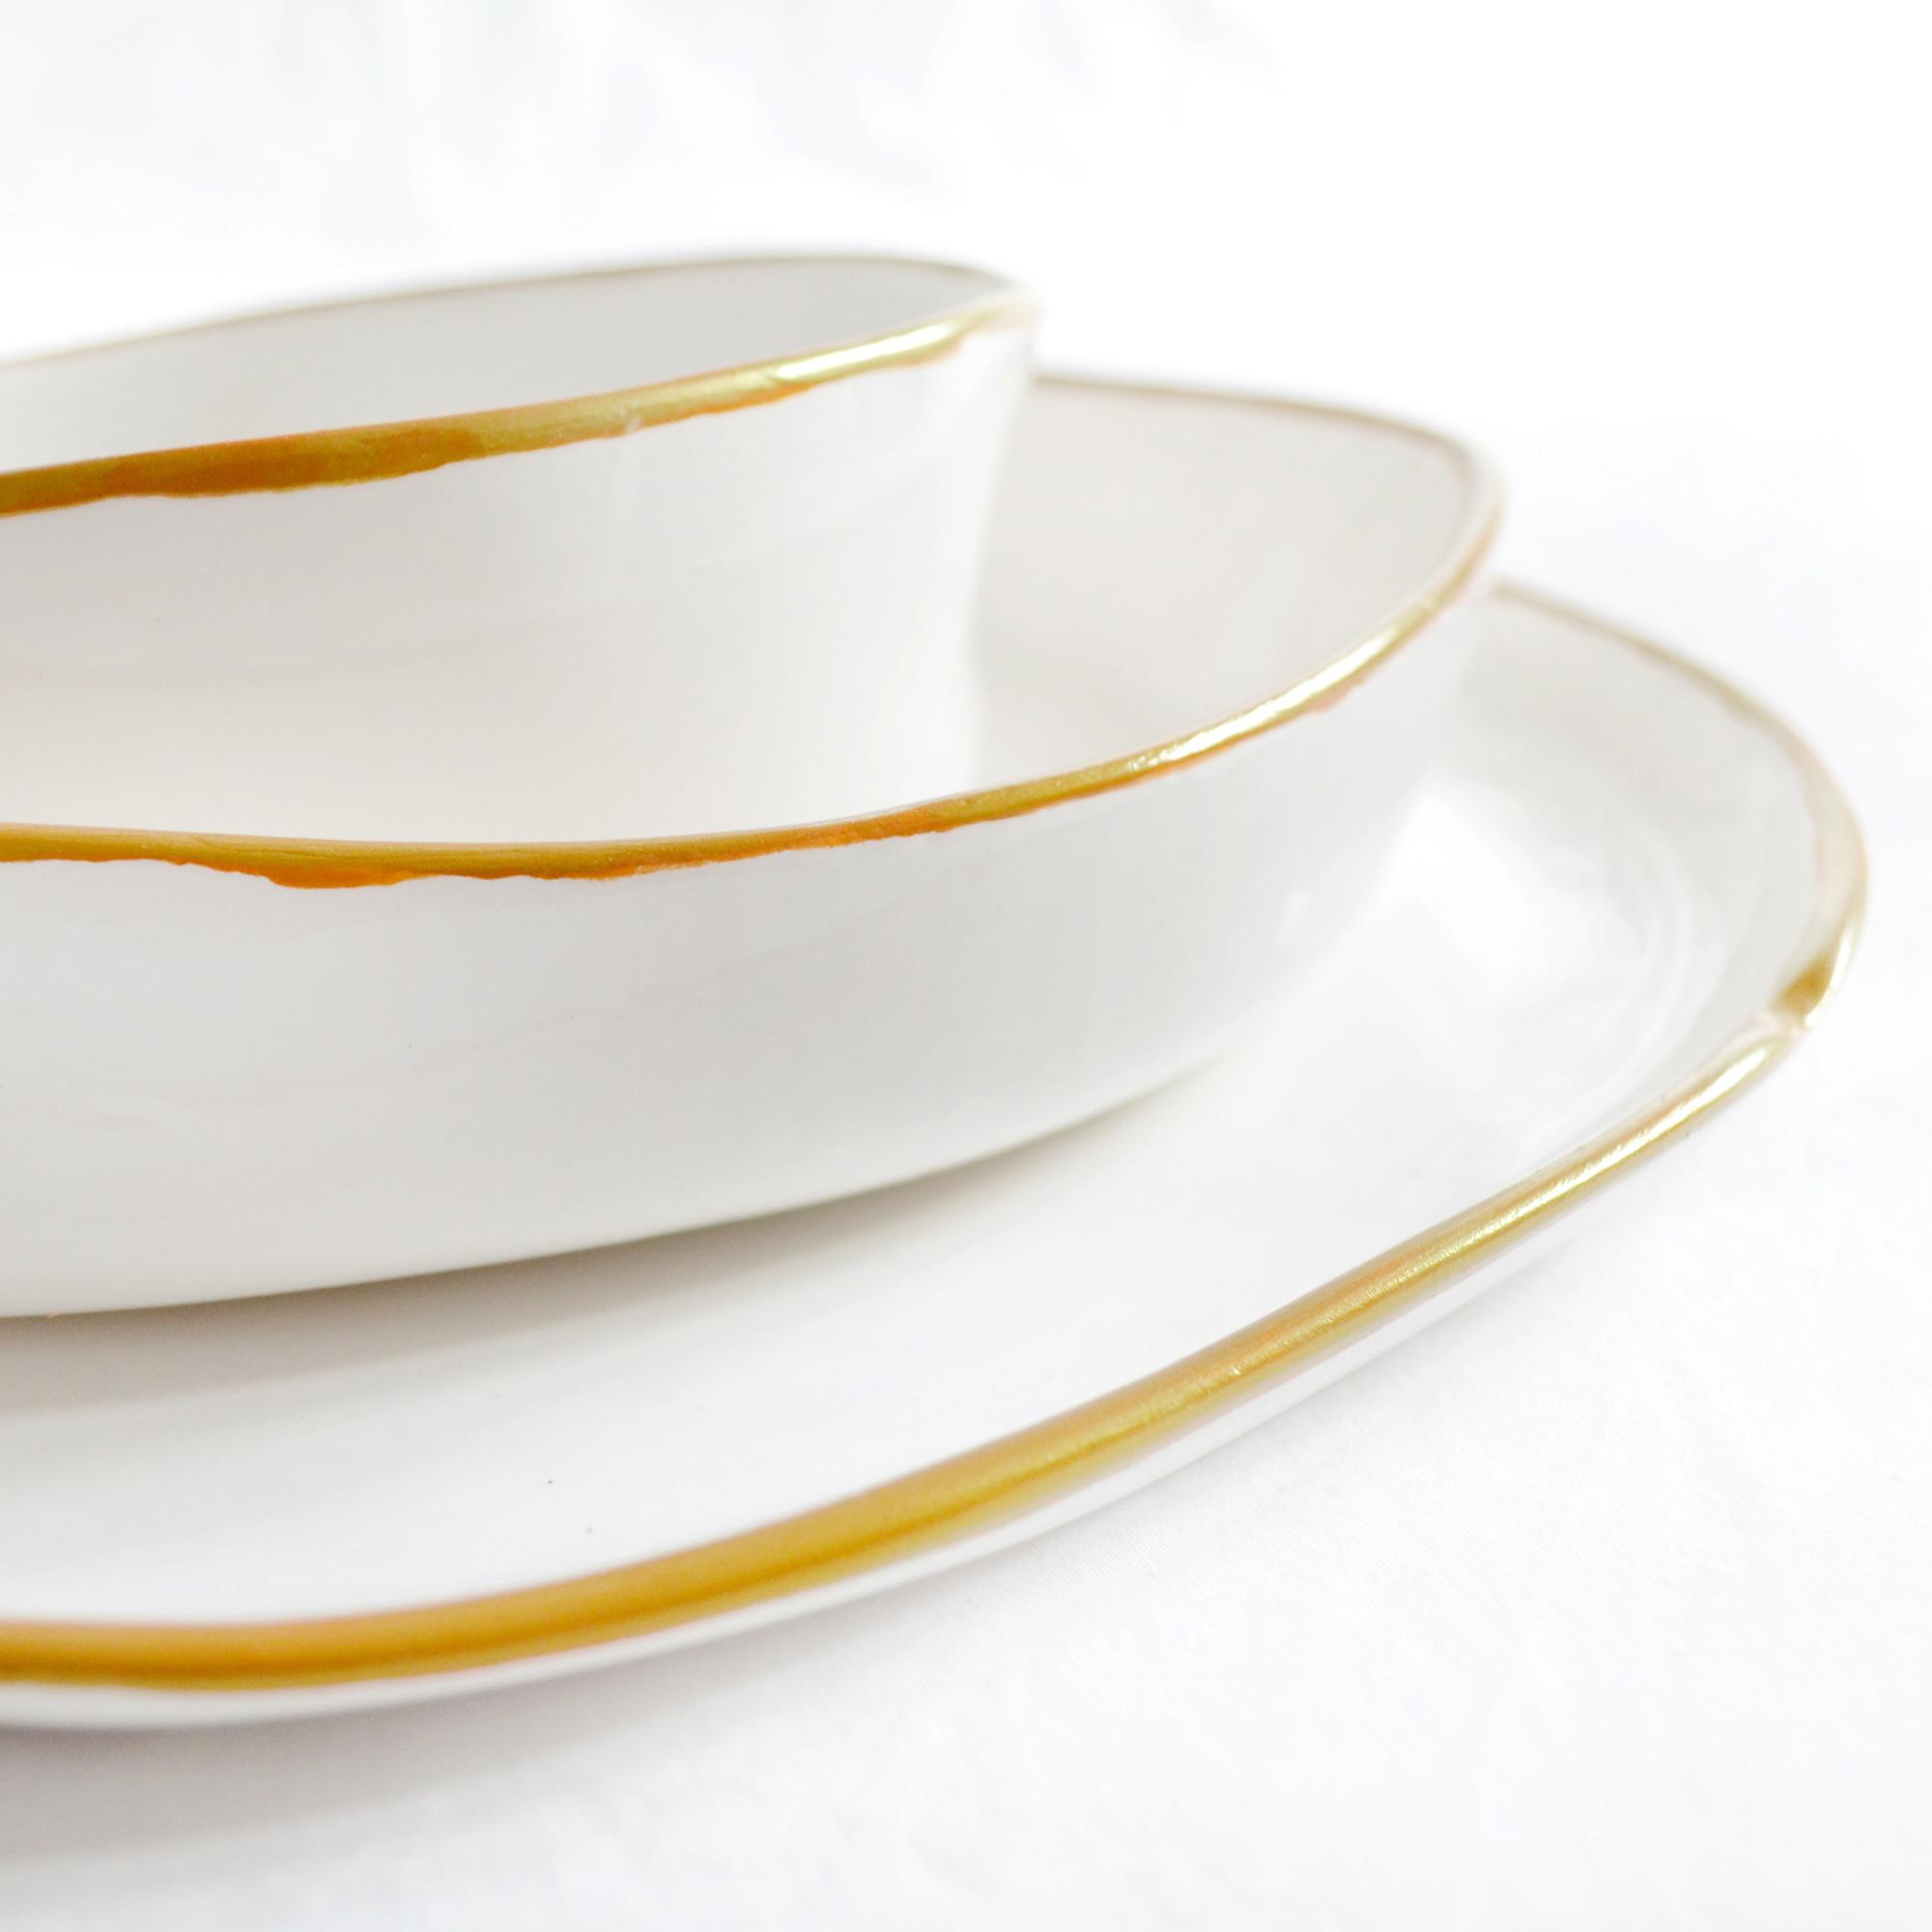 detalle platos artesanos de postre fabricados a mano